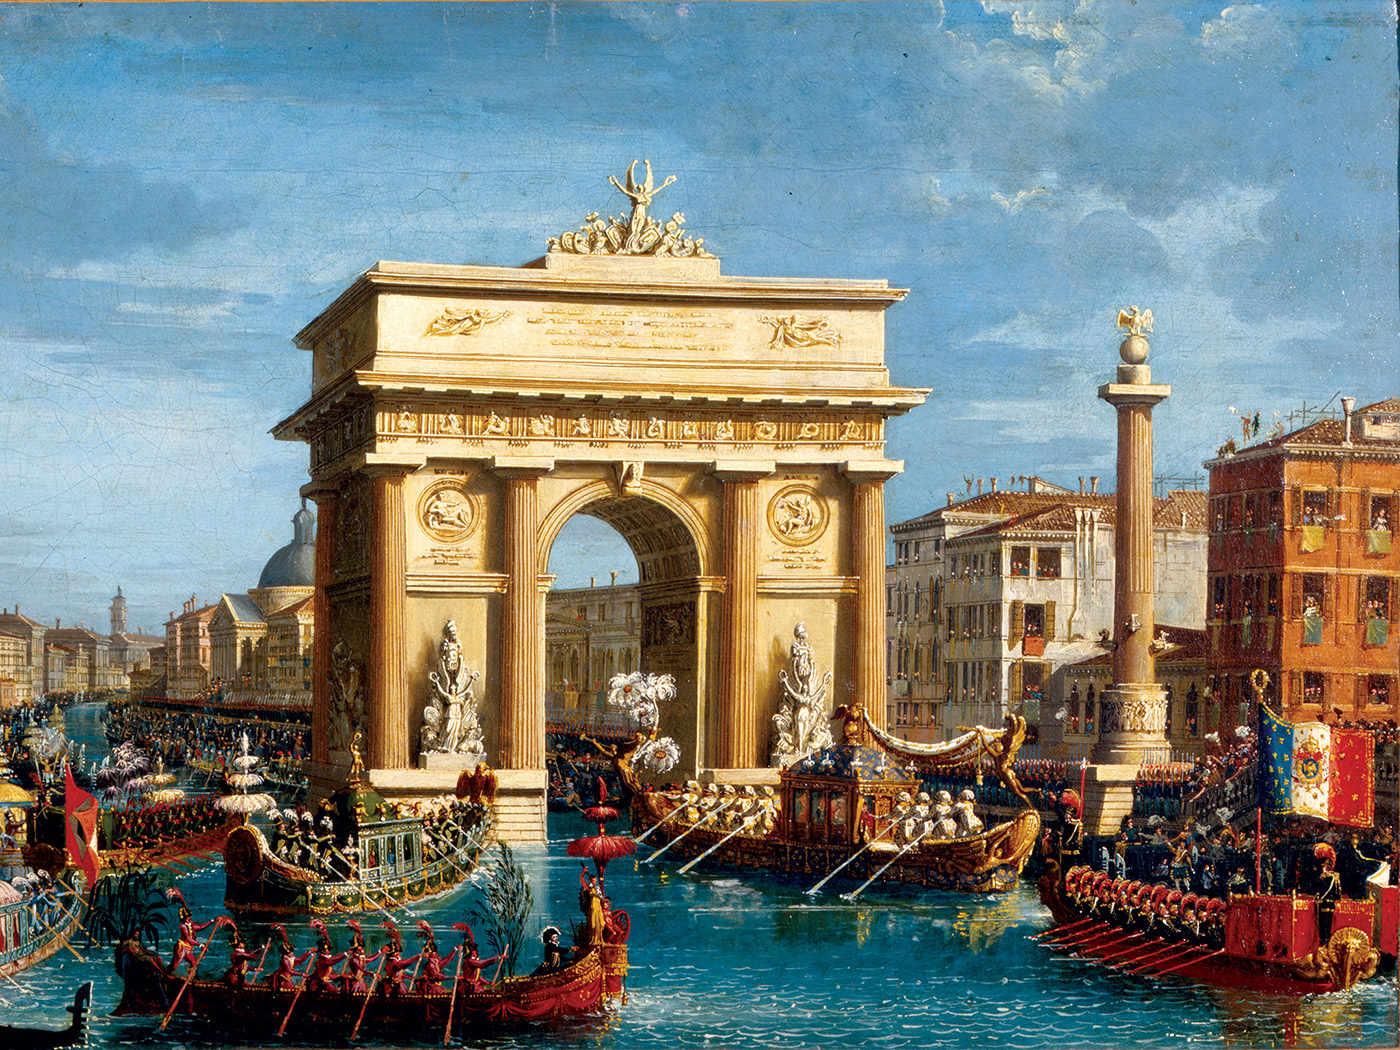 Arrival of Napoleon in Venice, by Giuseppe Borsato, 19th century.